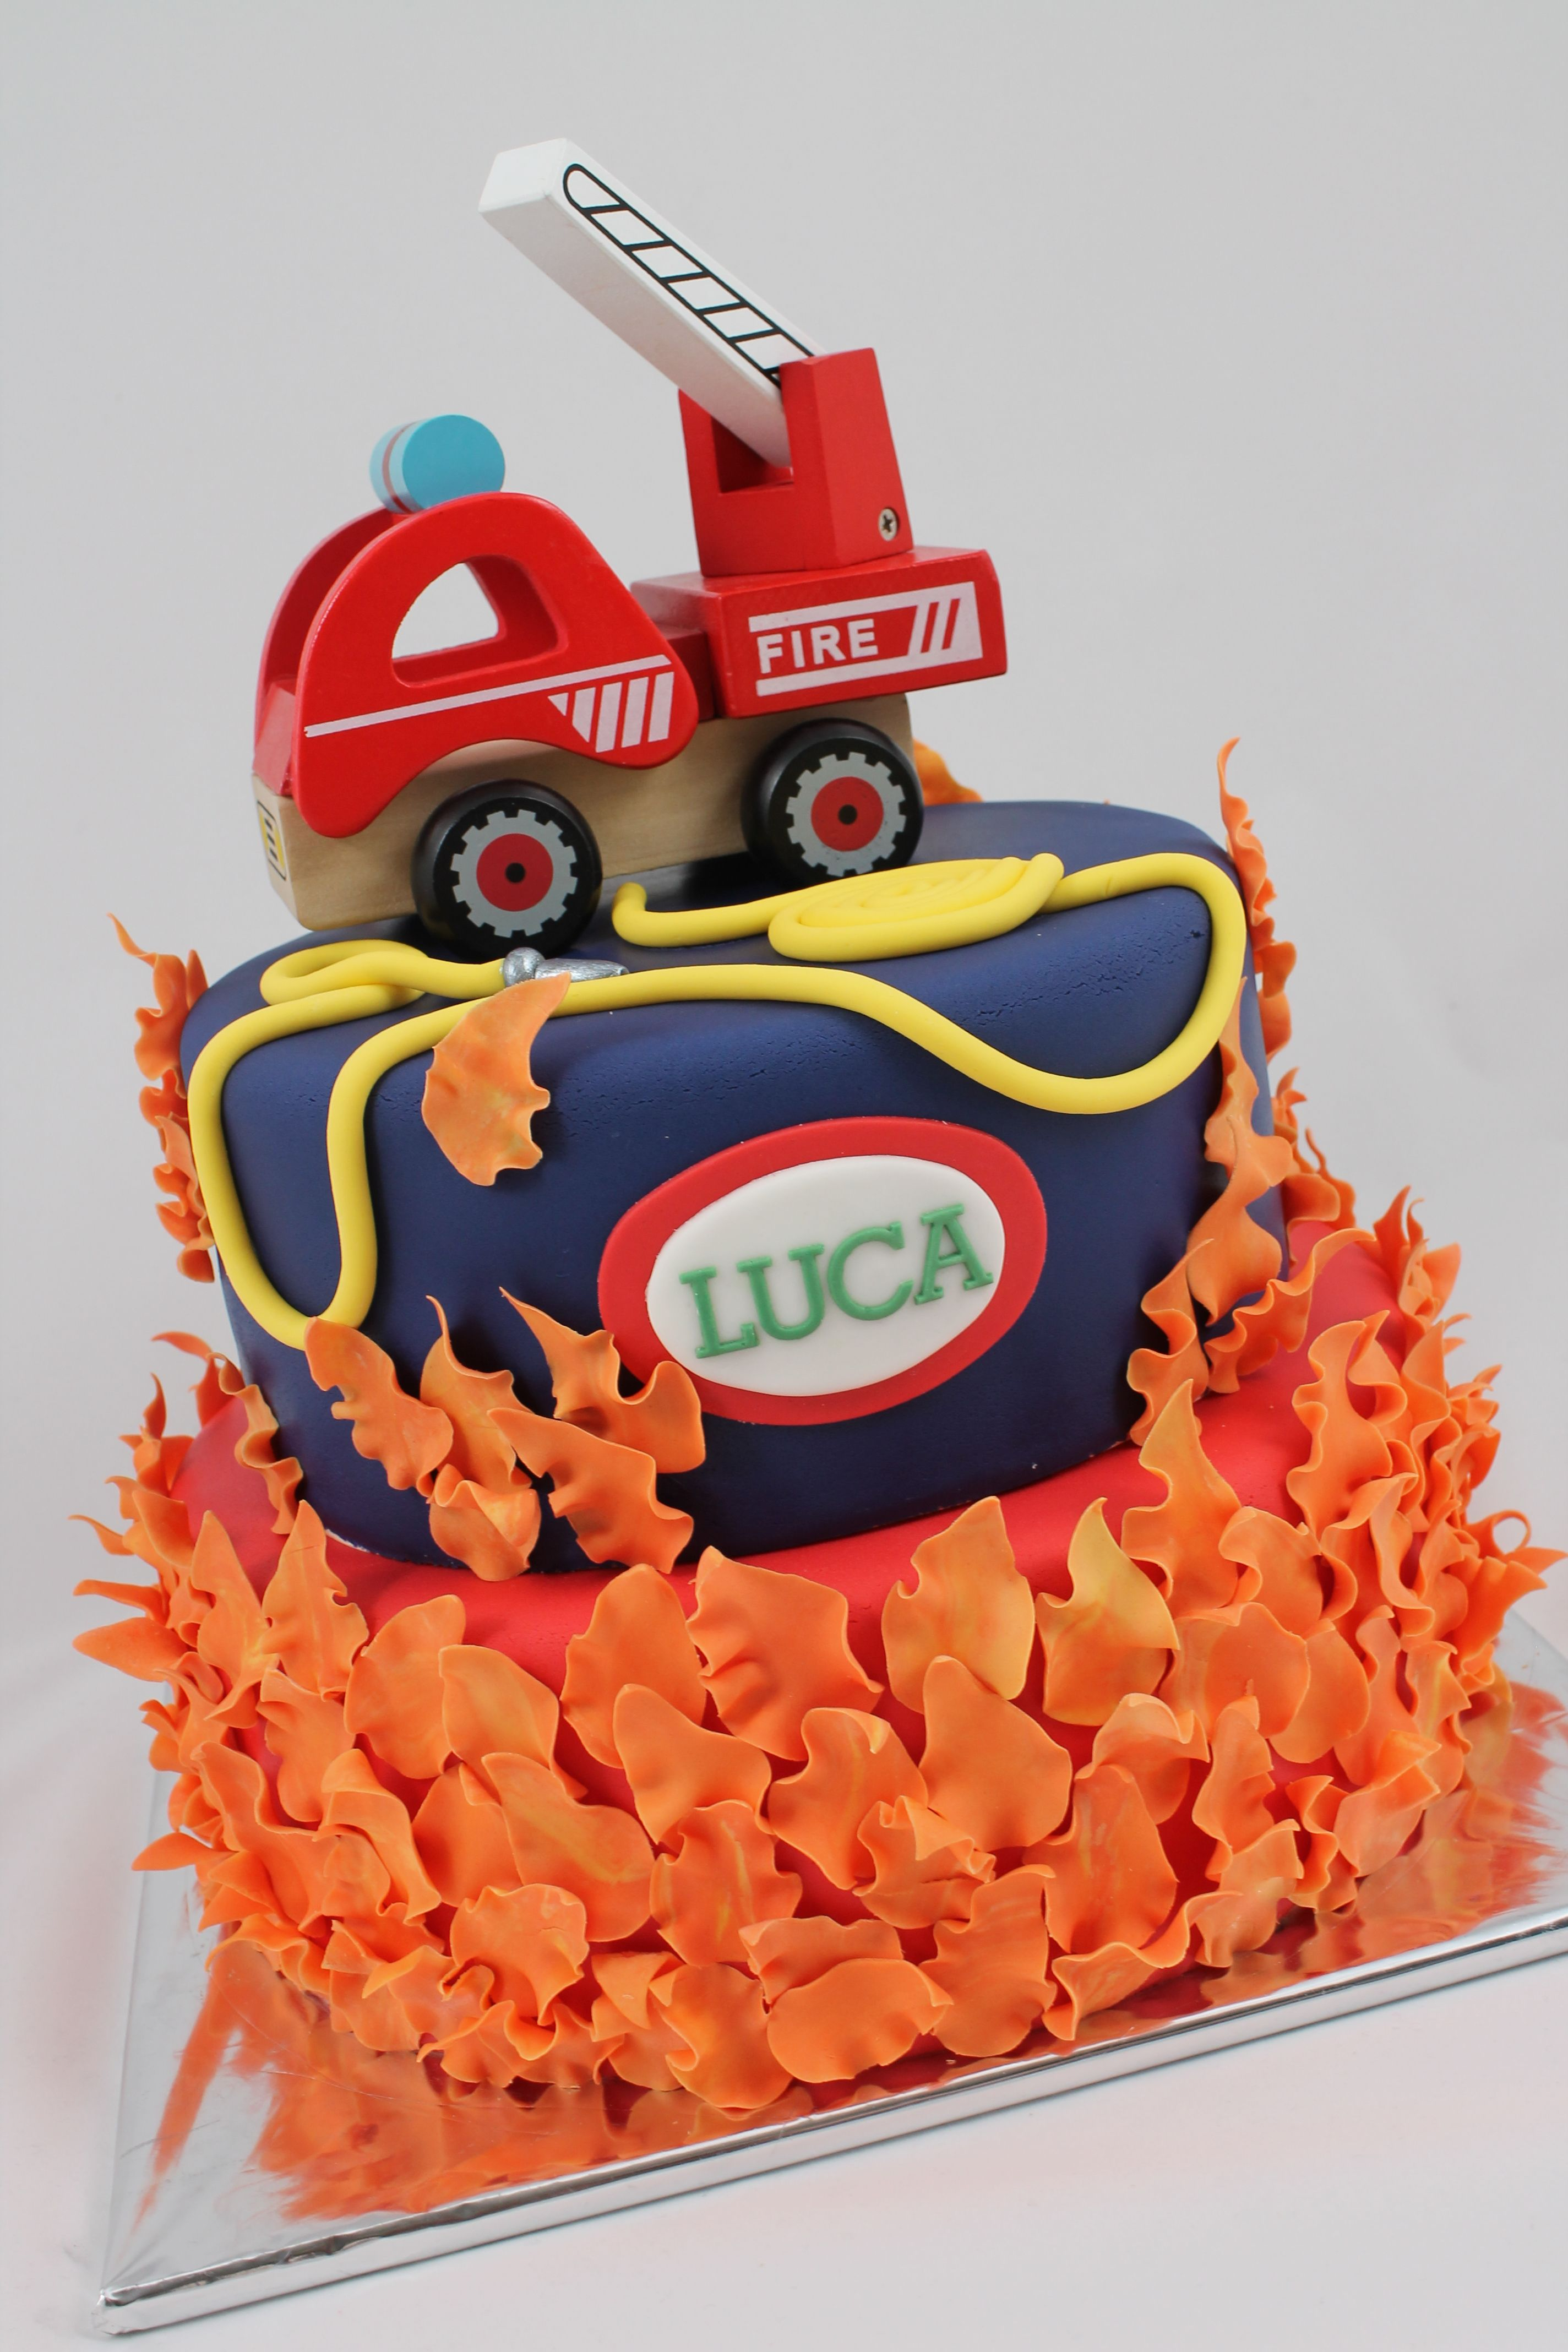 Fireman Firefighter Cake